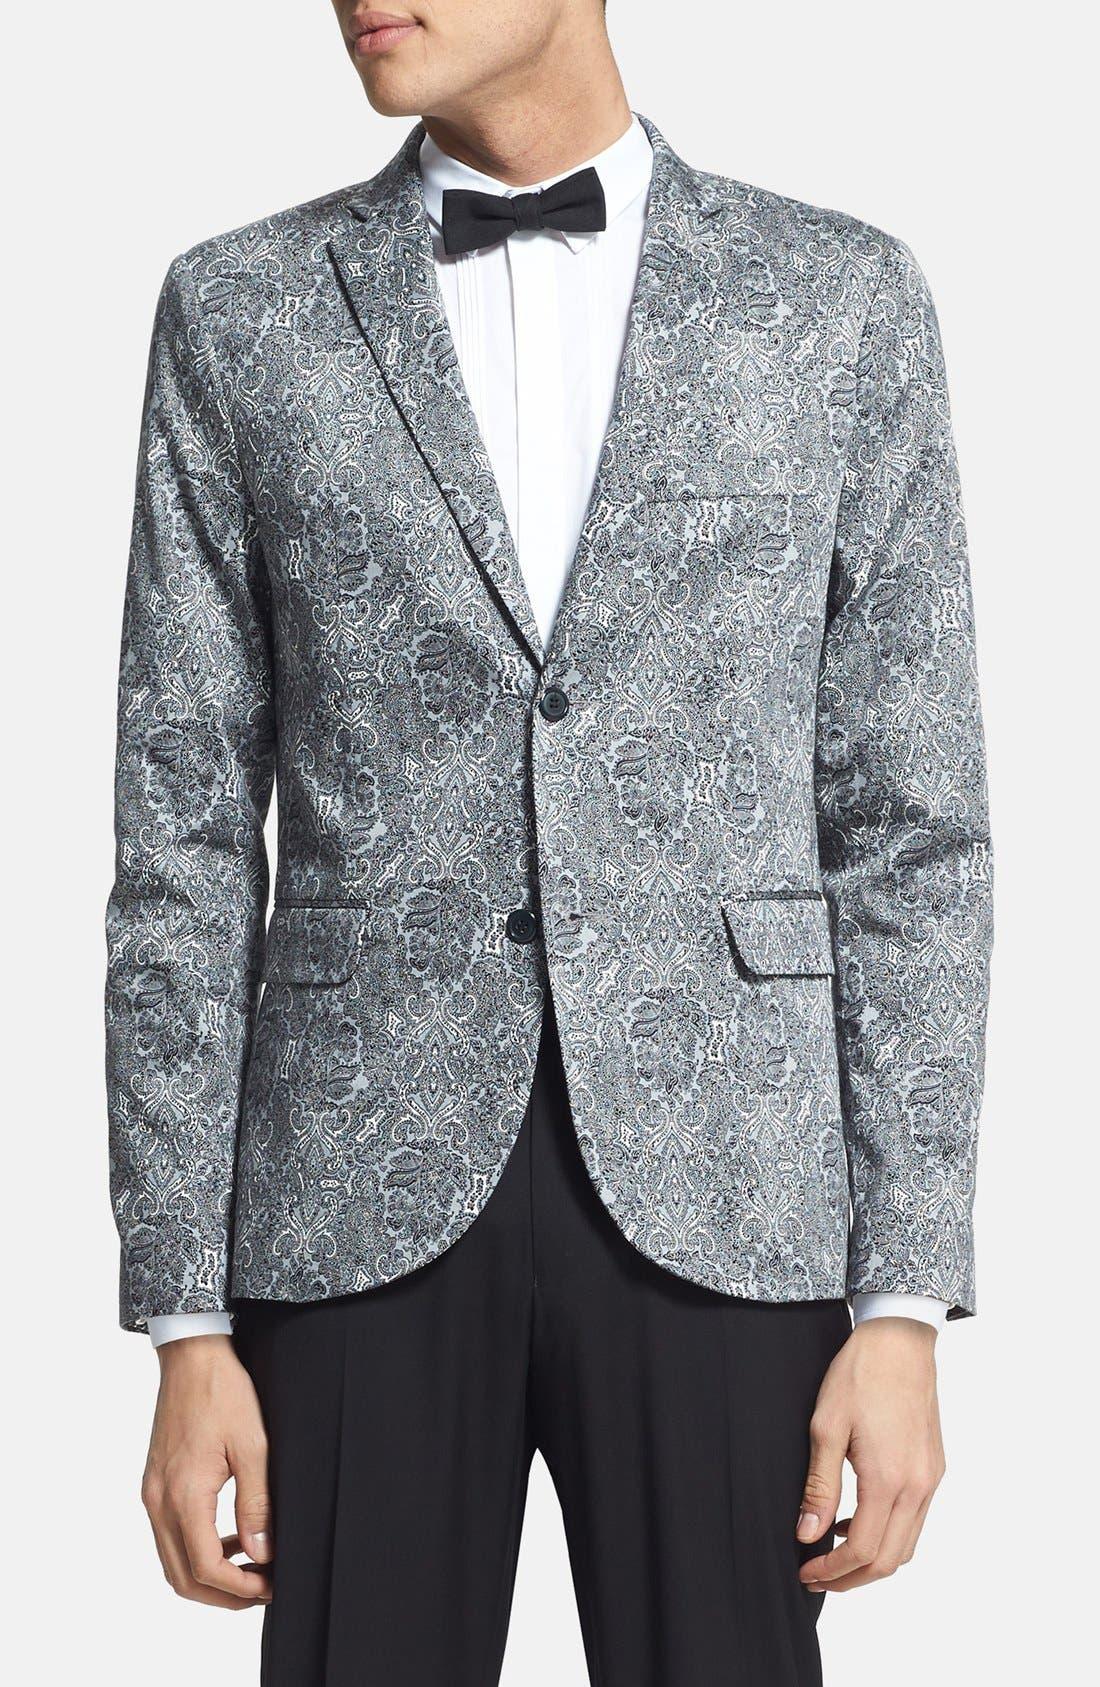 Main Image - Topman Skinny Fit Paisley Print Suit Jacket